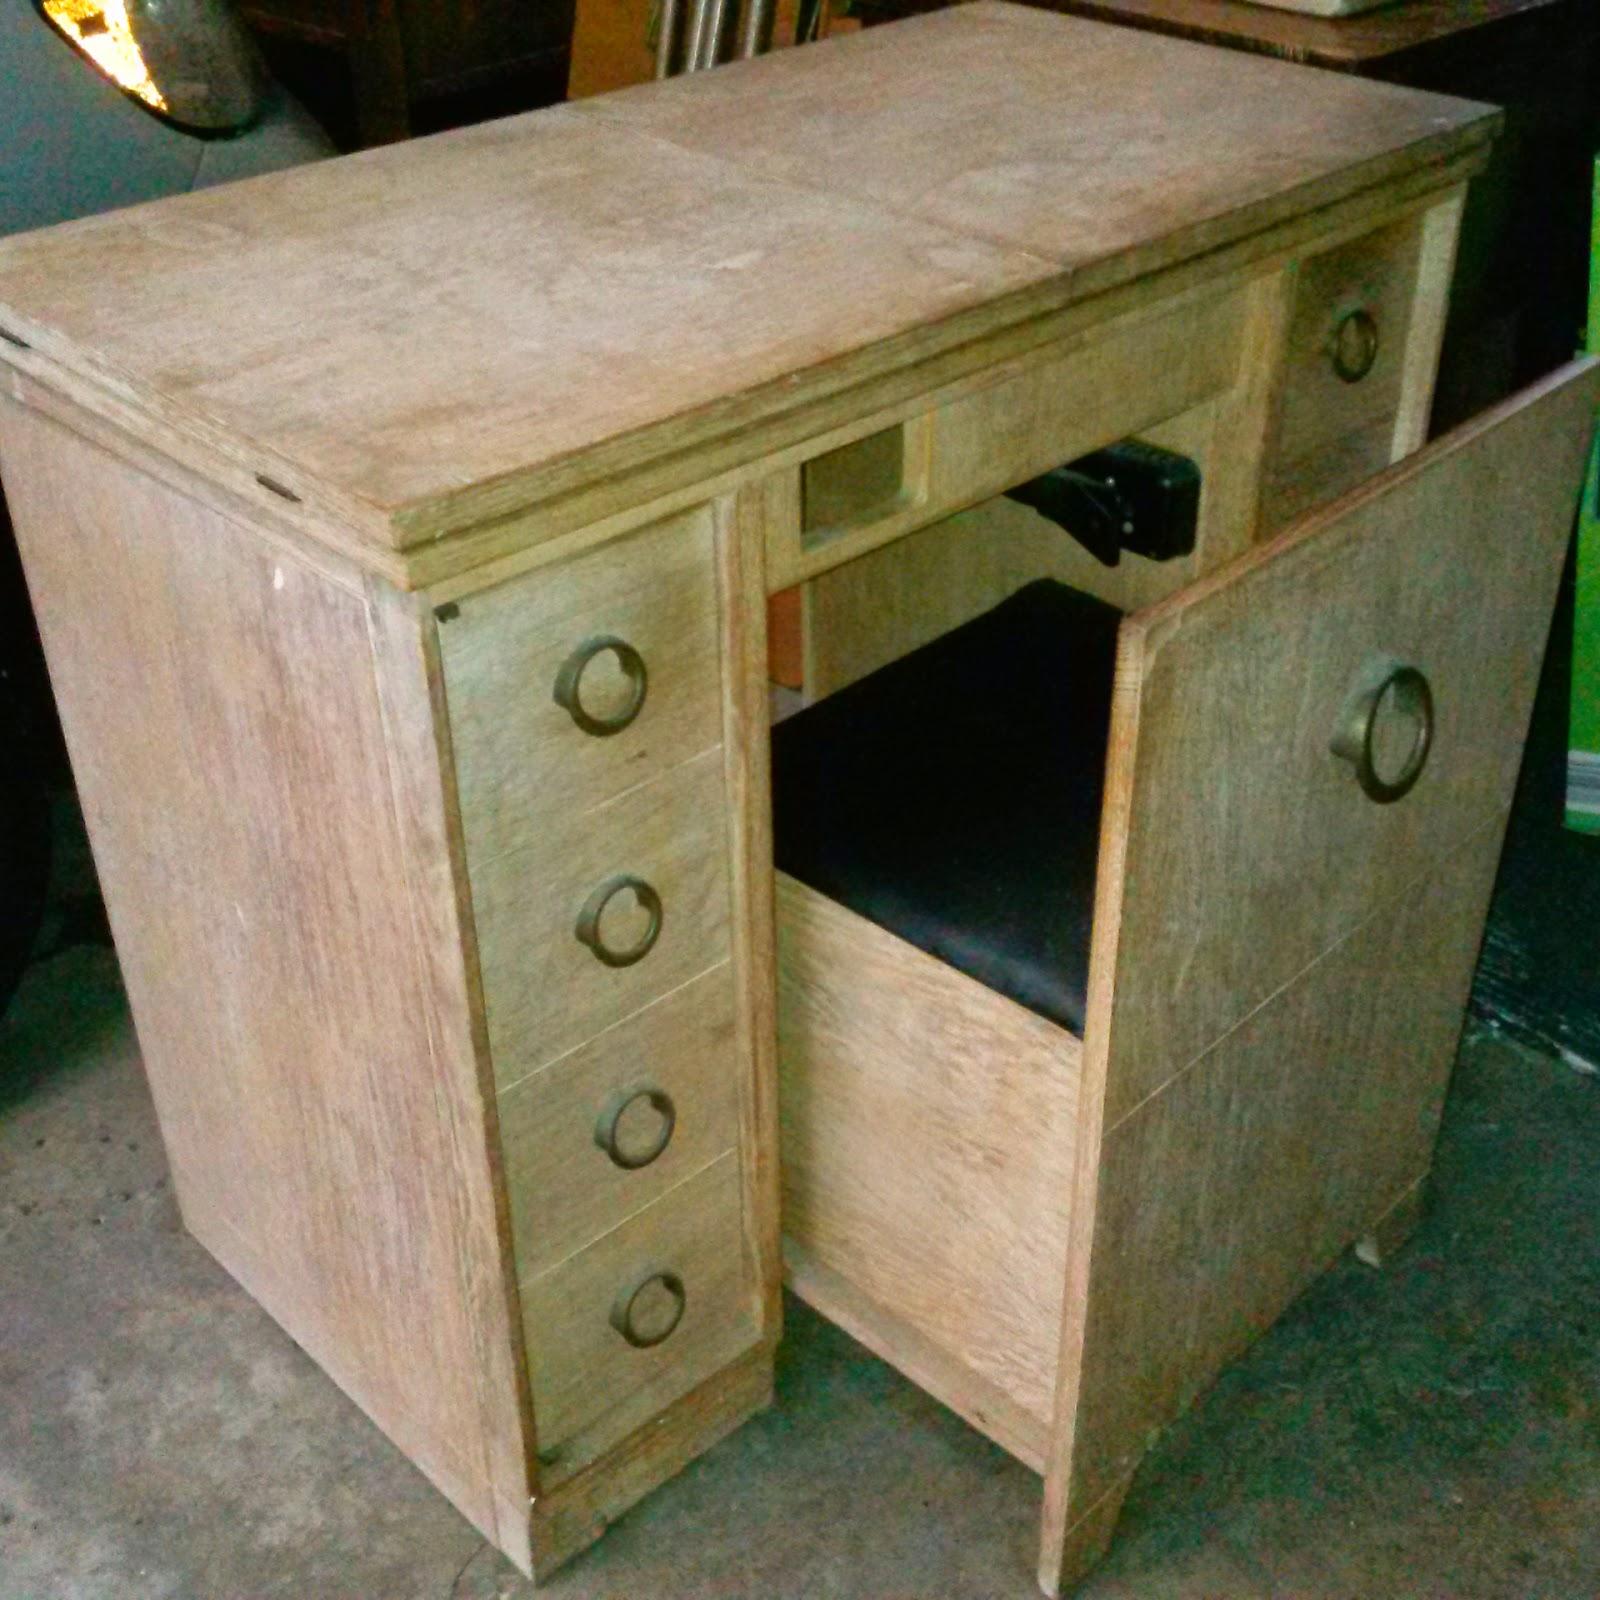 Sewing Machine Mavin: The Cabinet Craze